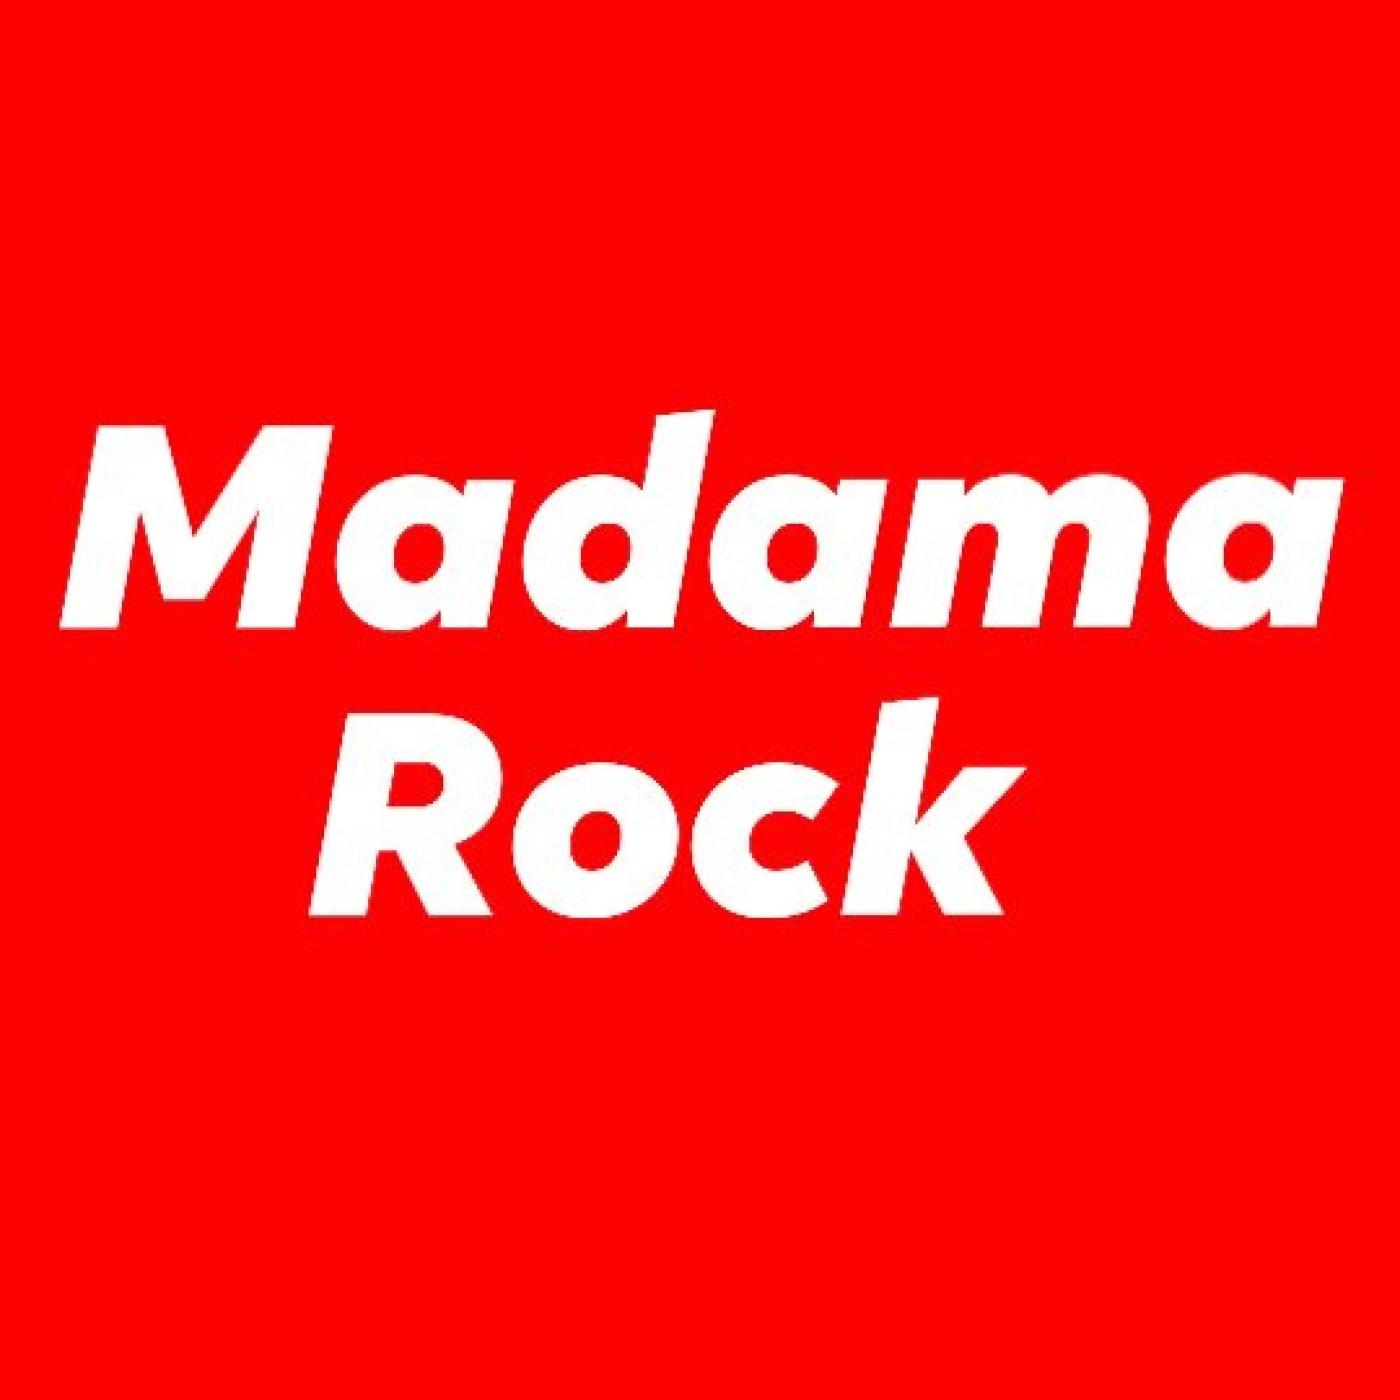 213Rock Podcast Madama Rock Harrag Melodica Doc Olivier - Christophe Babin Attraction Theory -  27 01 2020